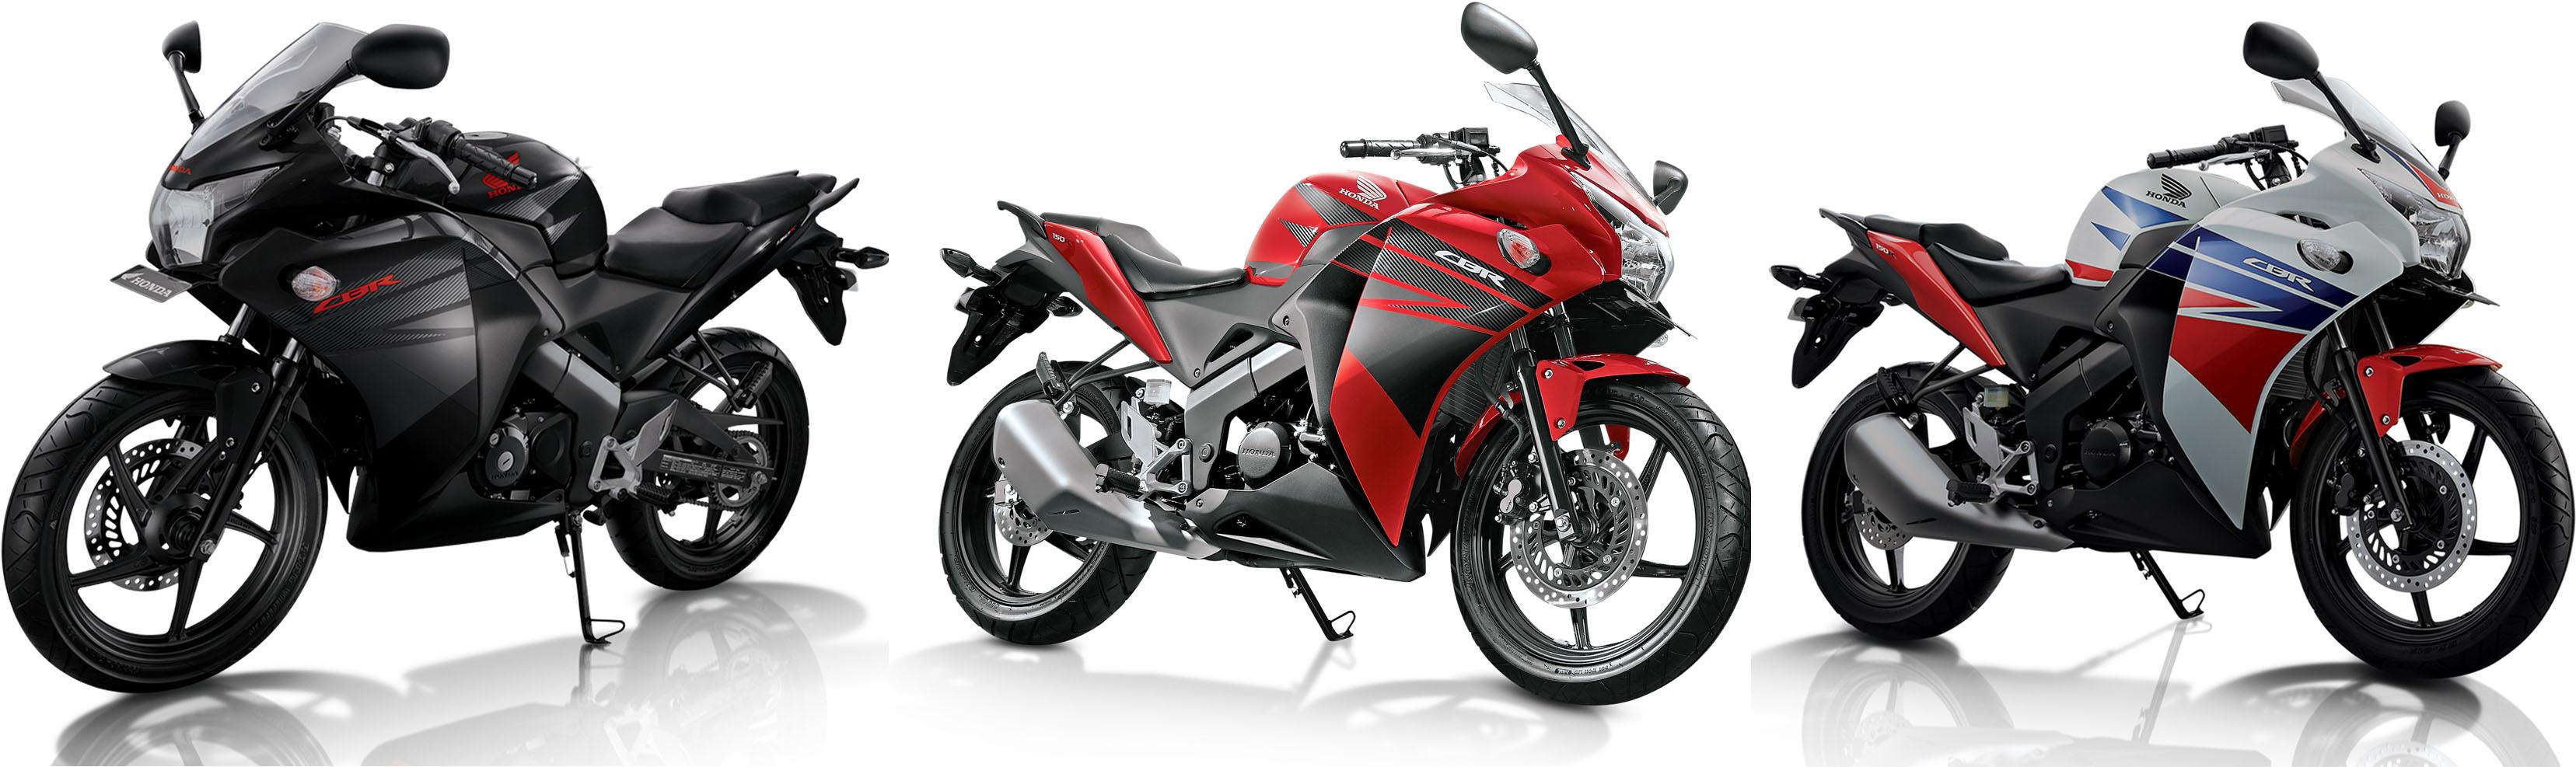 Cbr150r Teras Belitong Blog Laman 2 All New Cbr 150r Racing Red Kota Semarang